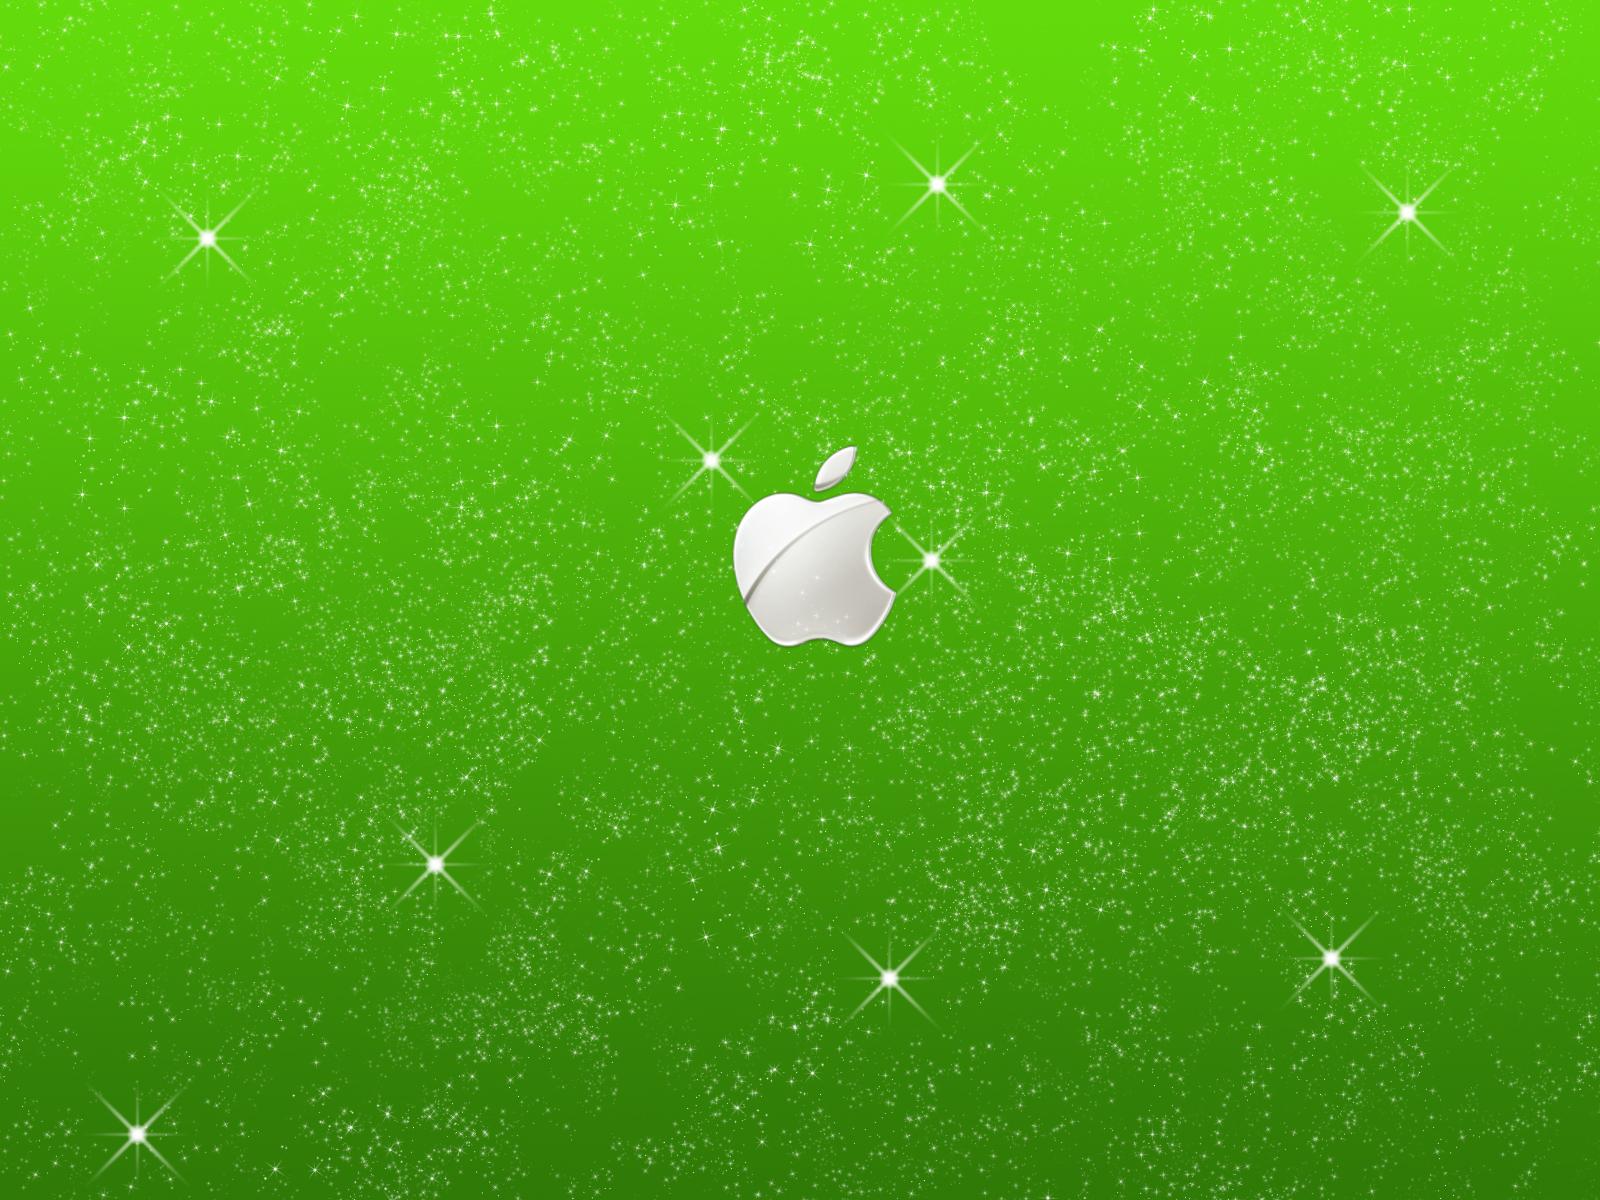 Apple Starry Wallpaper